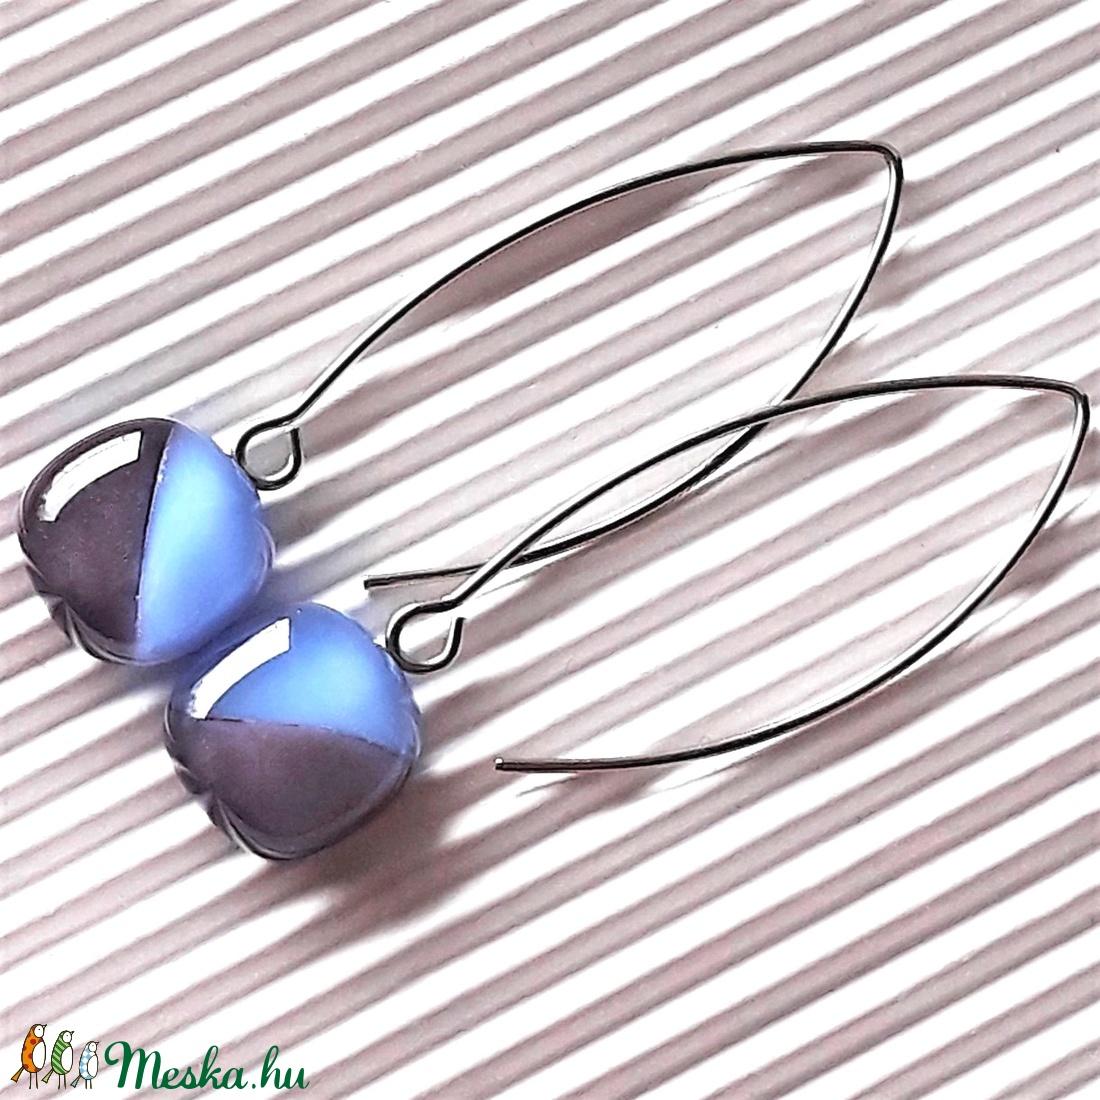 Orgona-levendula lógós kocka üveg fülbevaló orvosi fém hosszú design akasztón, üvegékszer - ékszer - fülbevaló - lógó fülbevaló - Meska.hu